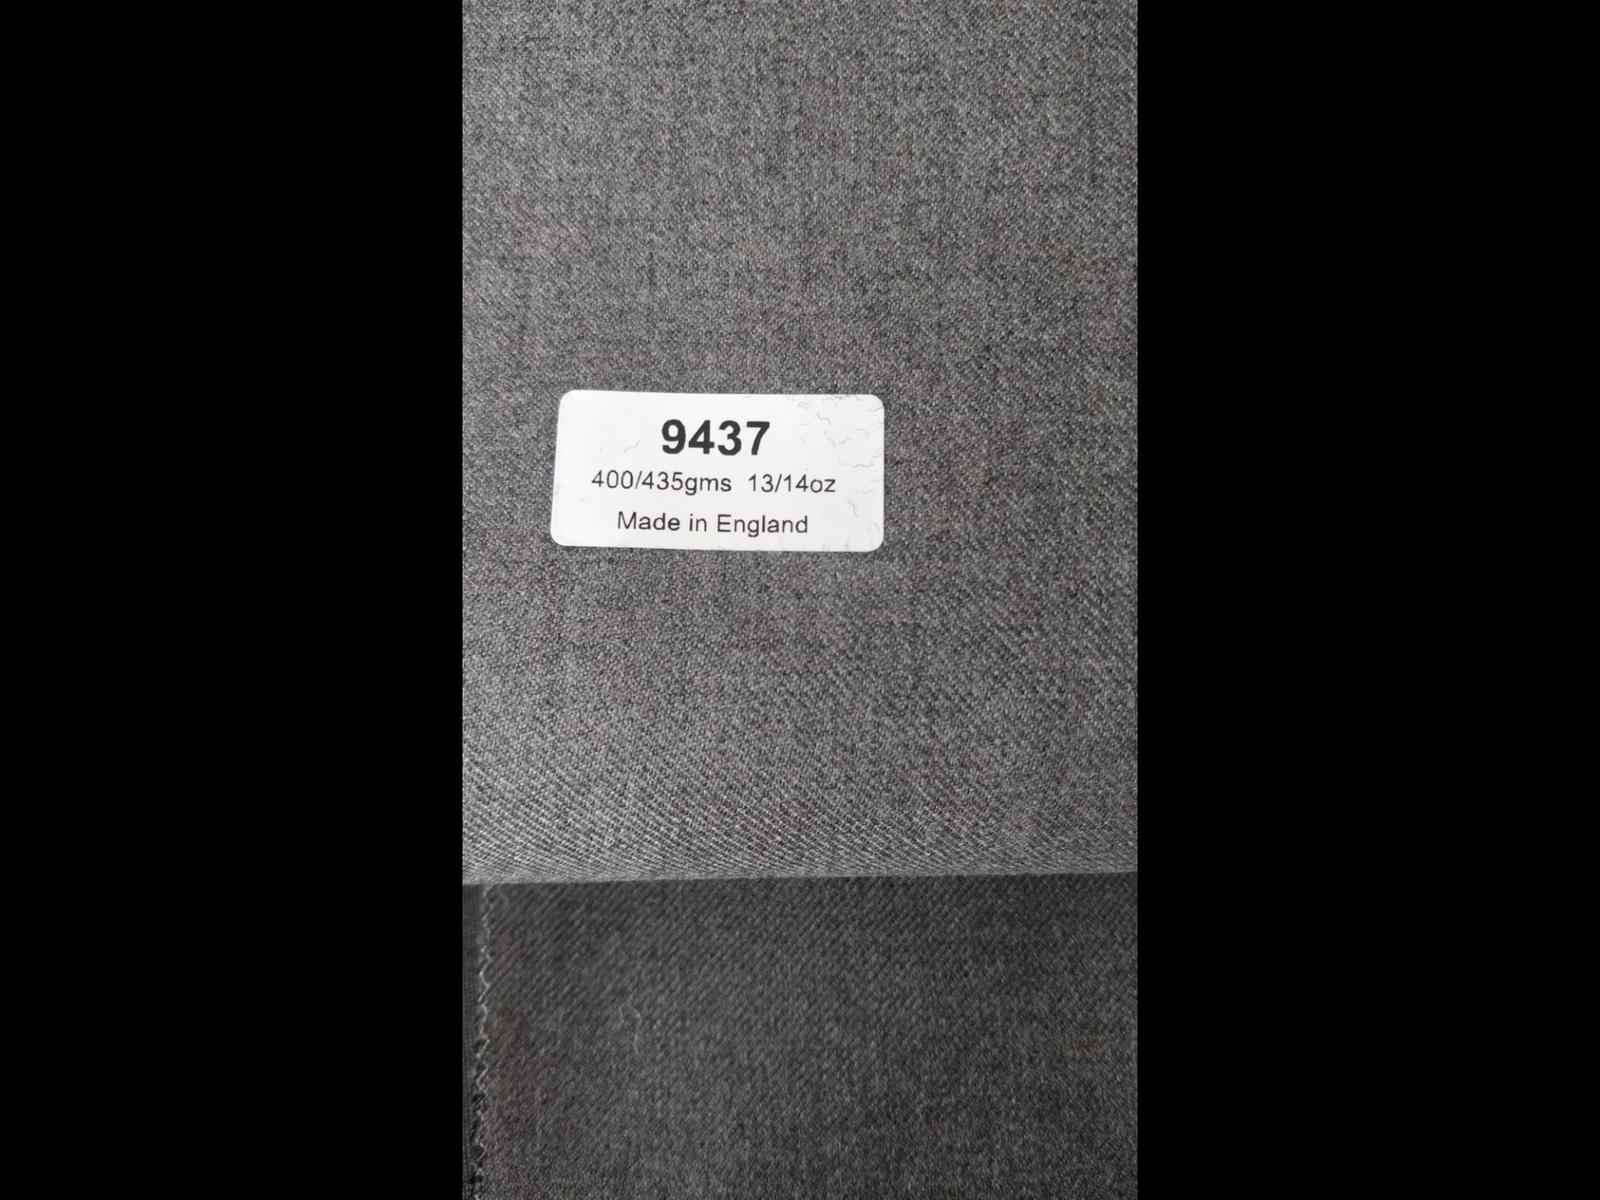 14CE98E7-BF3A-44A8-B9F3-9E3D0F77B5A5.png